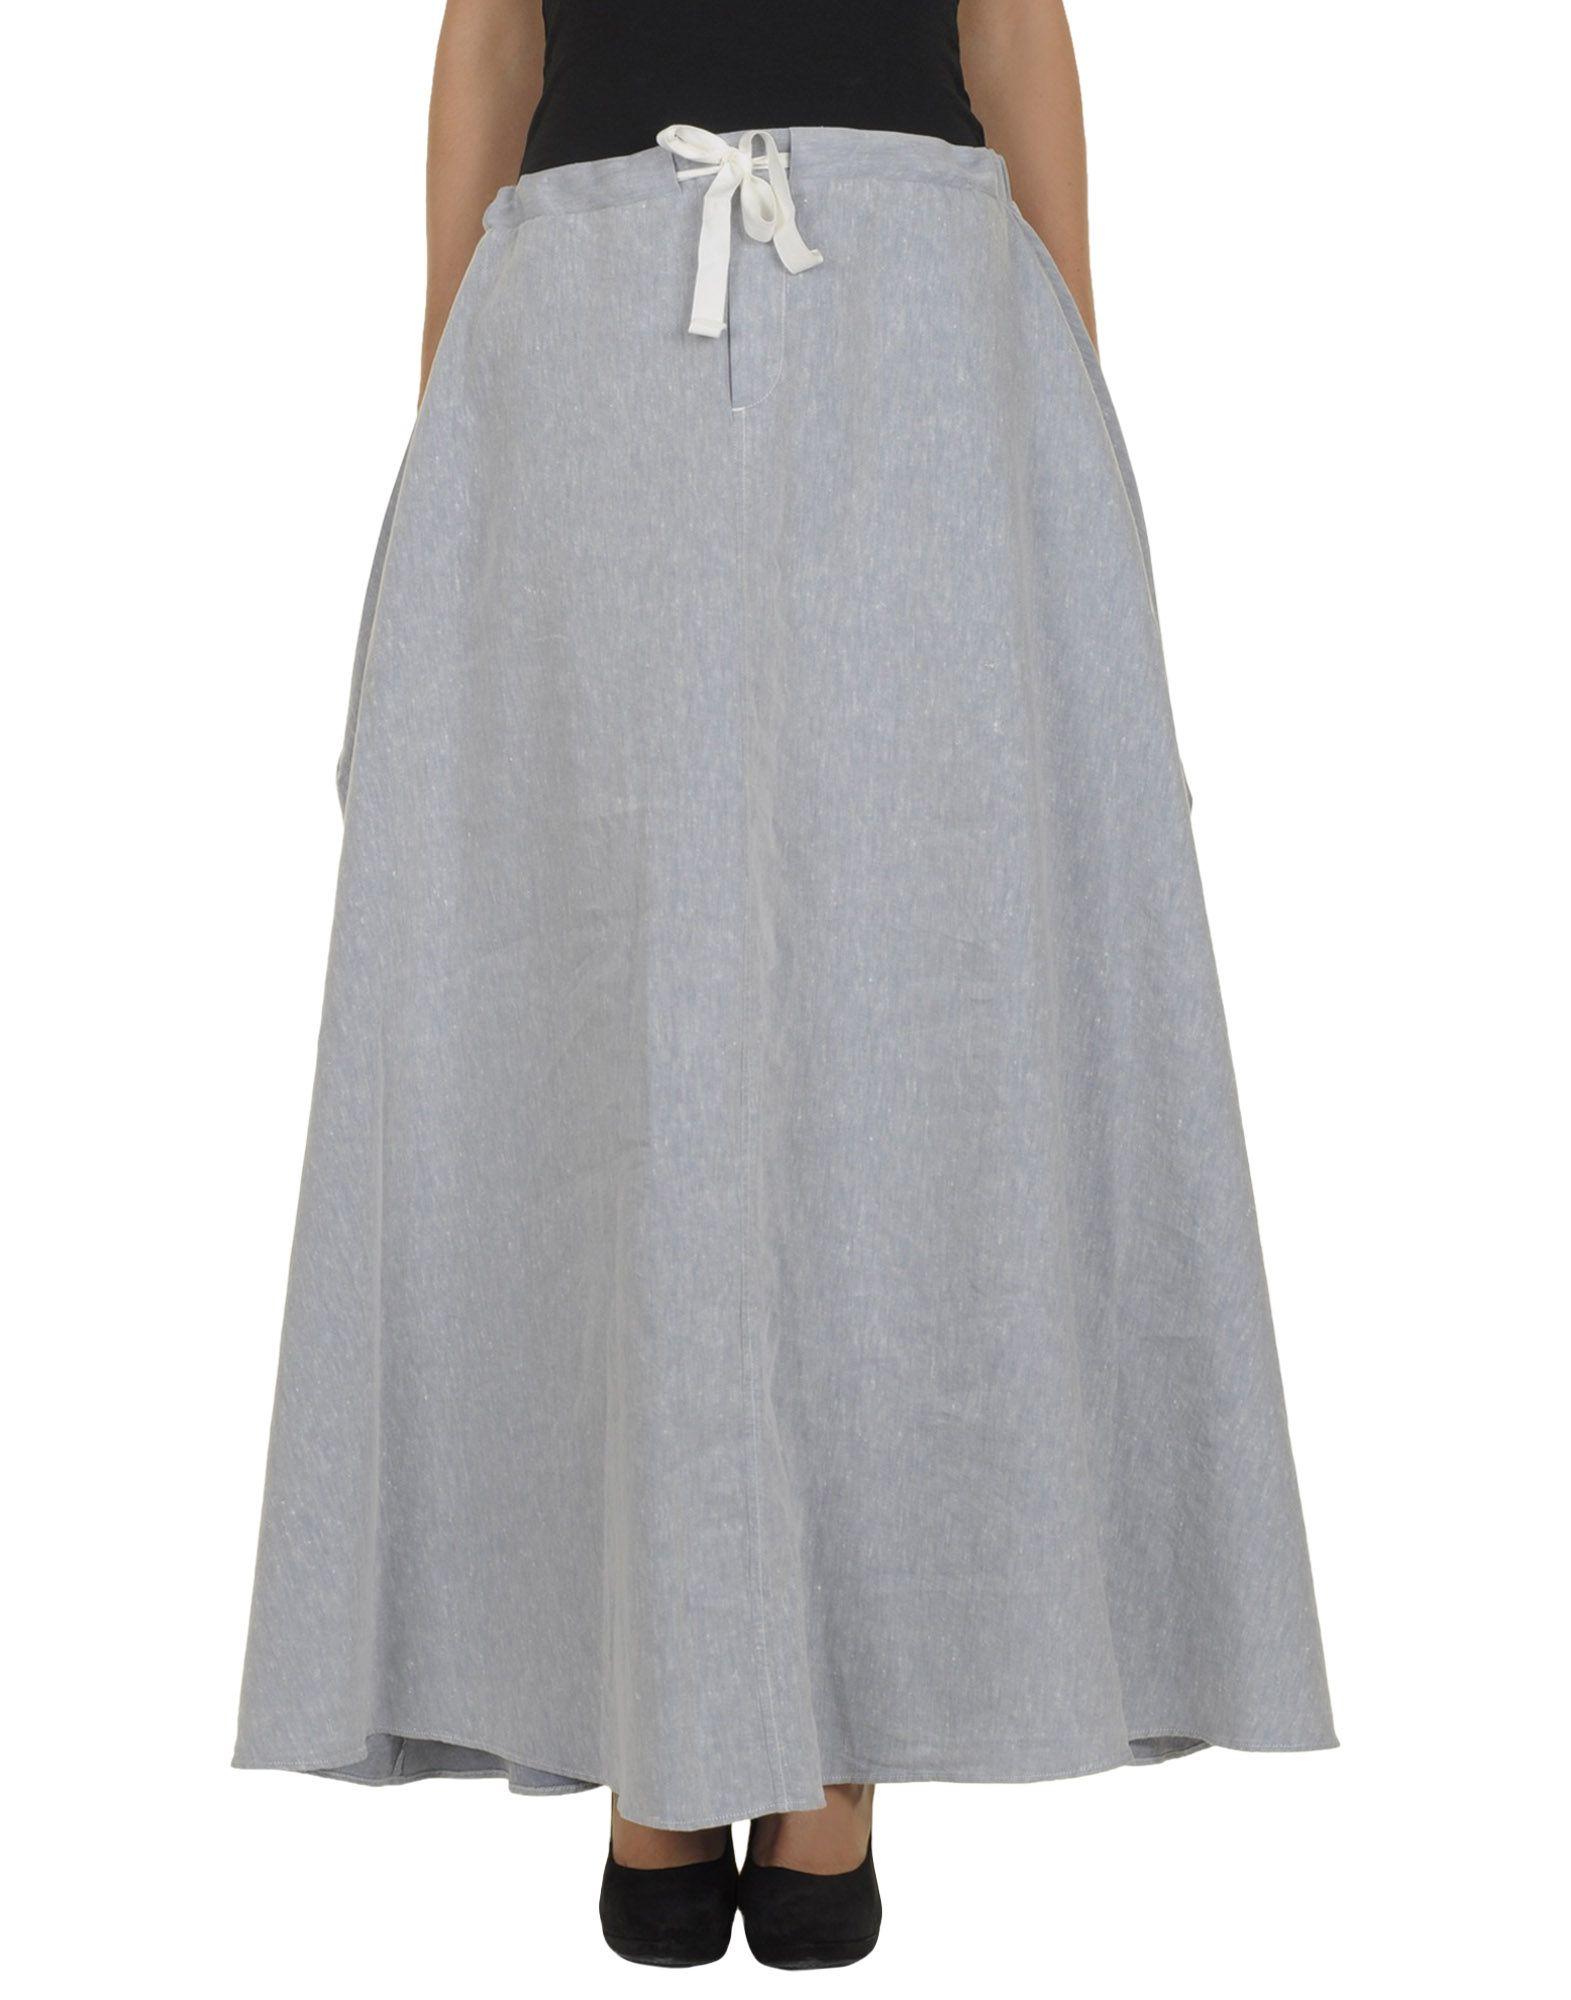 MM6 MAISON MARGIELA Длинная юбка 1 one длинная юбка